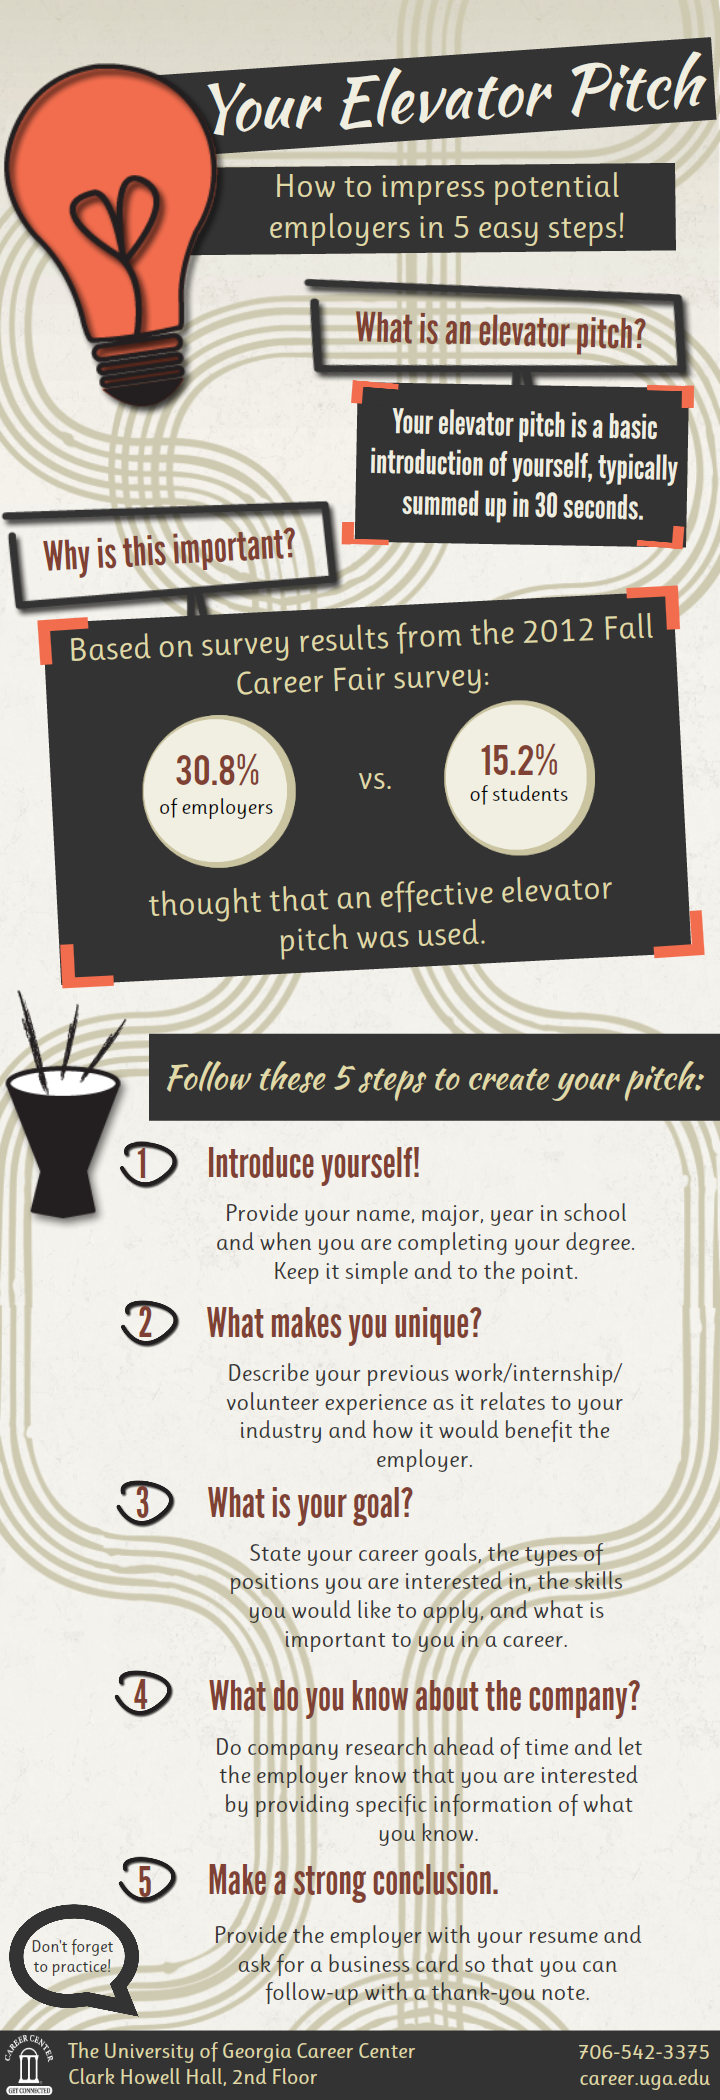 5 Basic Steps to Impress Employer by Elevator Pitch ...